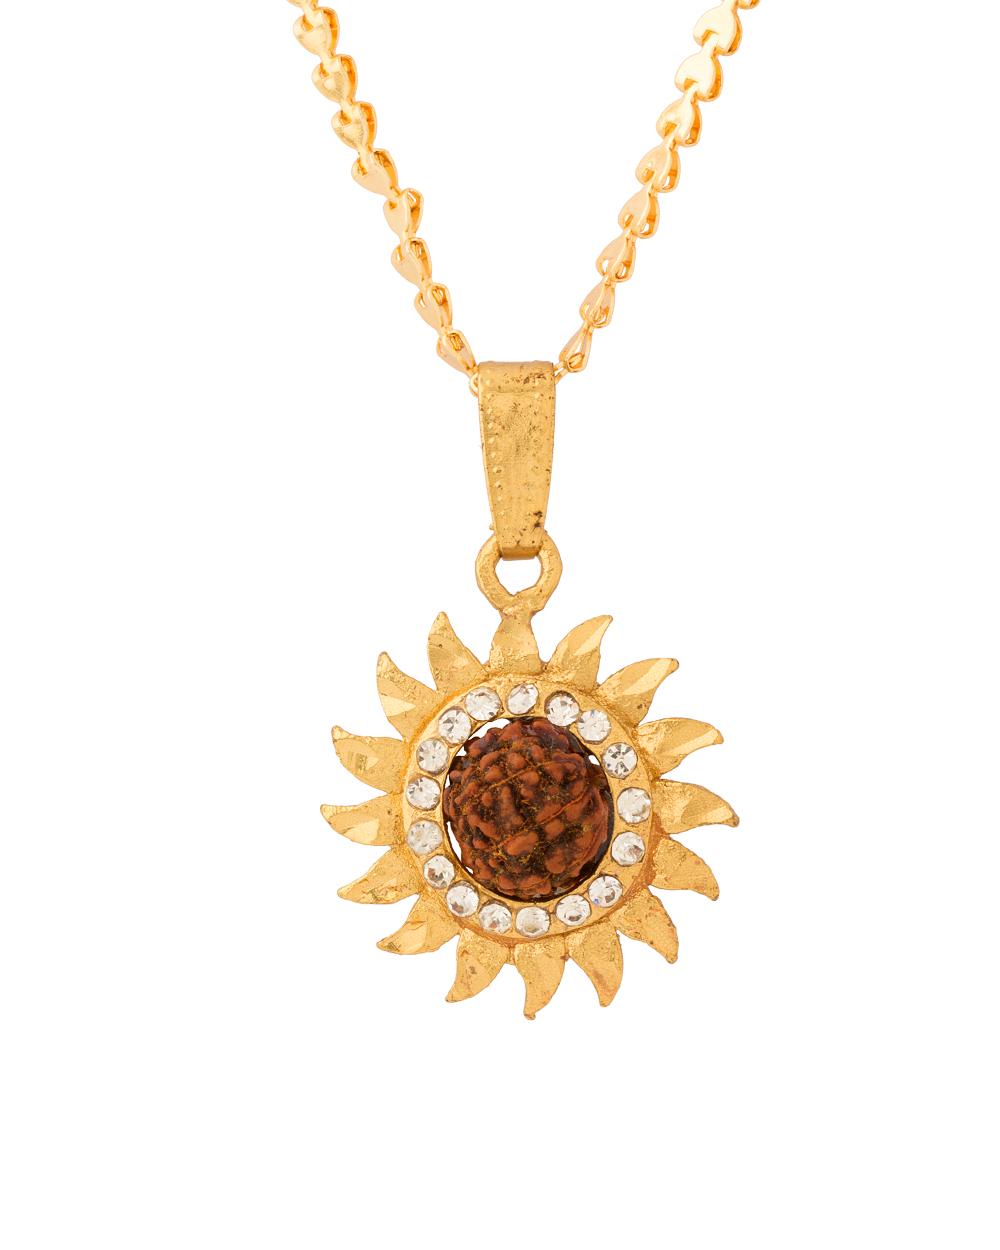 Buy Sun Design Pendant With Chain For Men Online India | Voylla